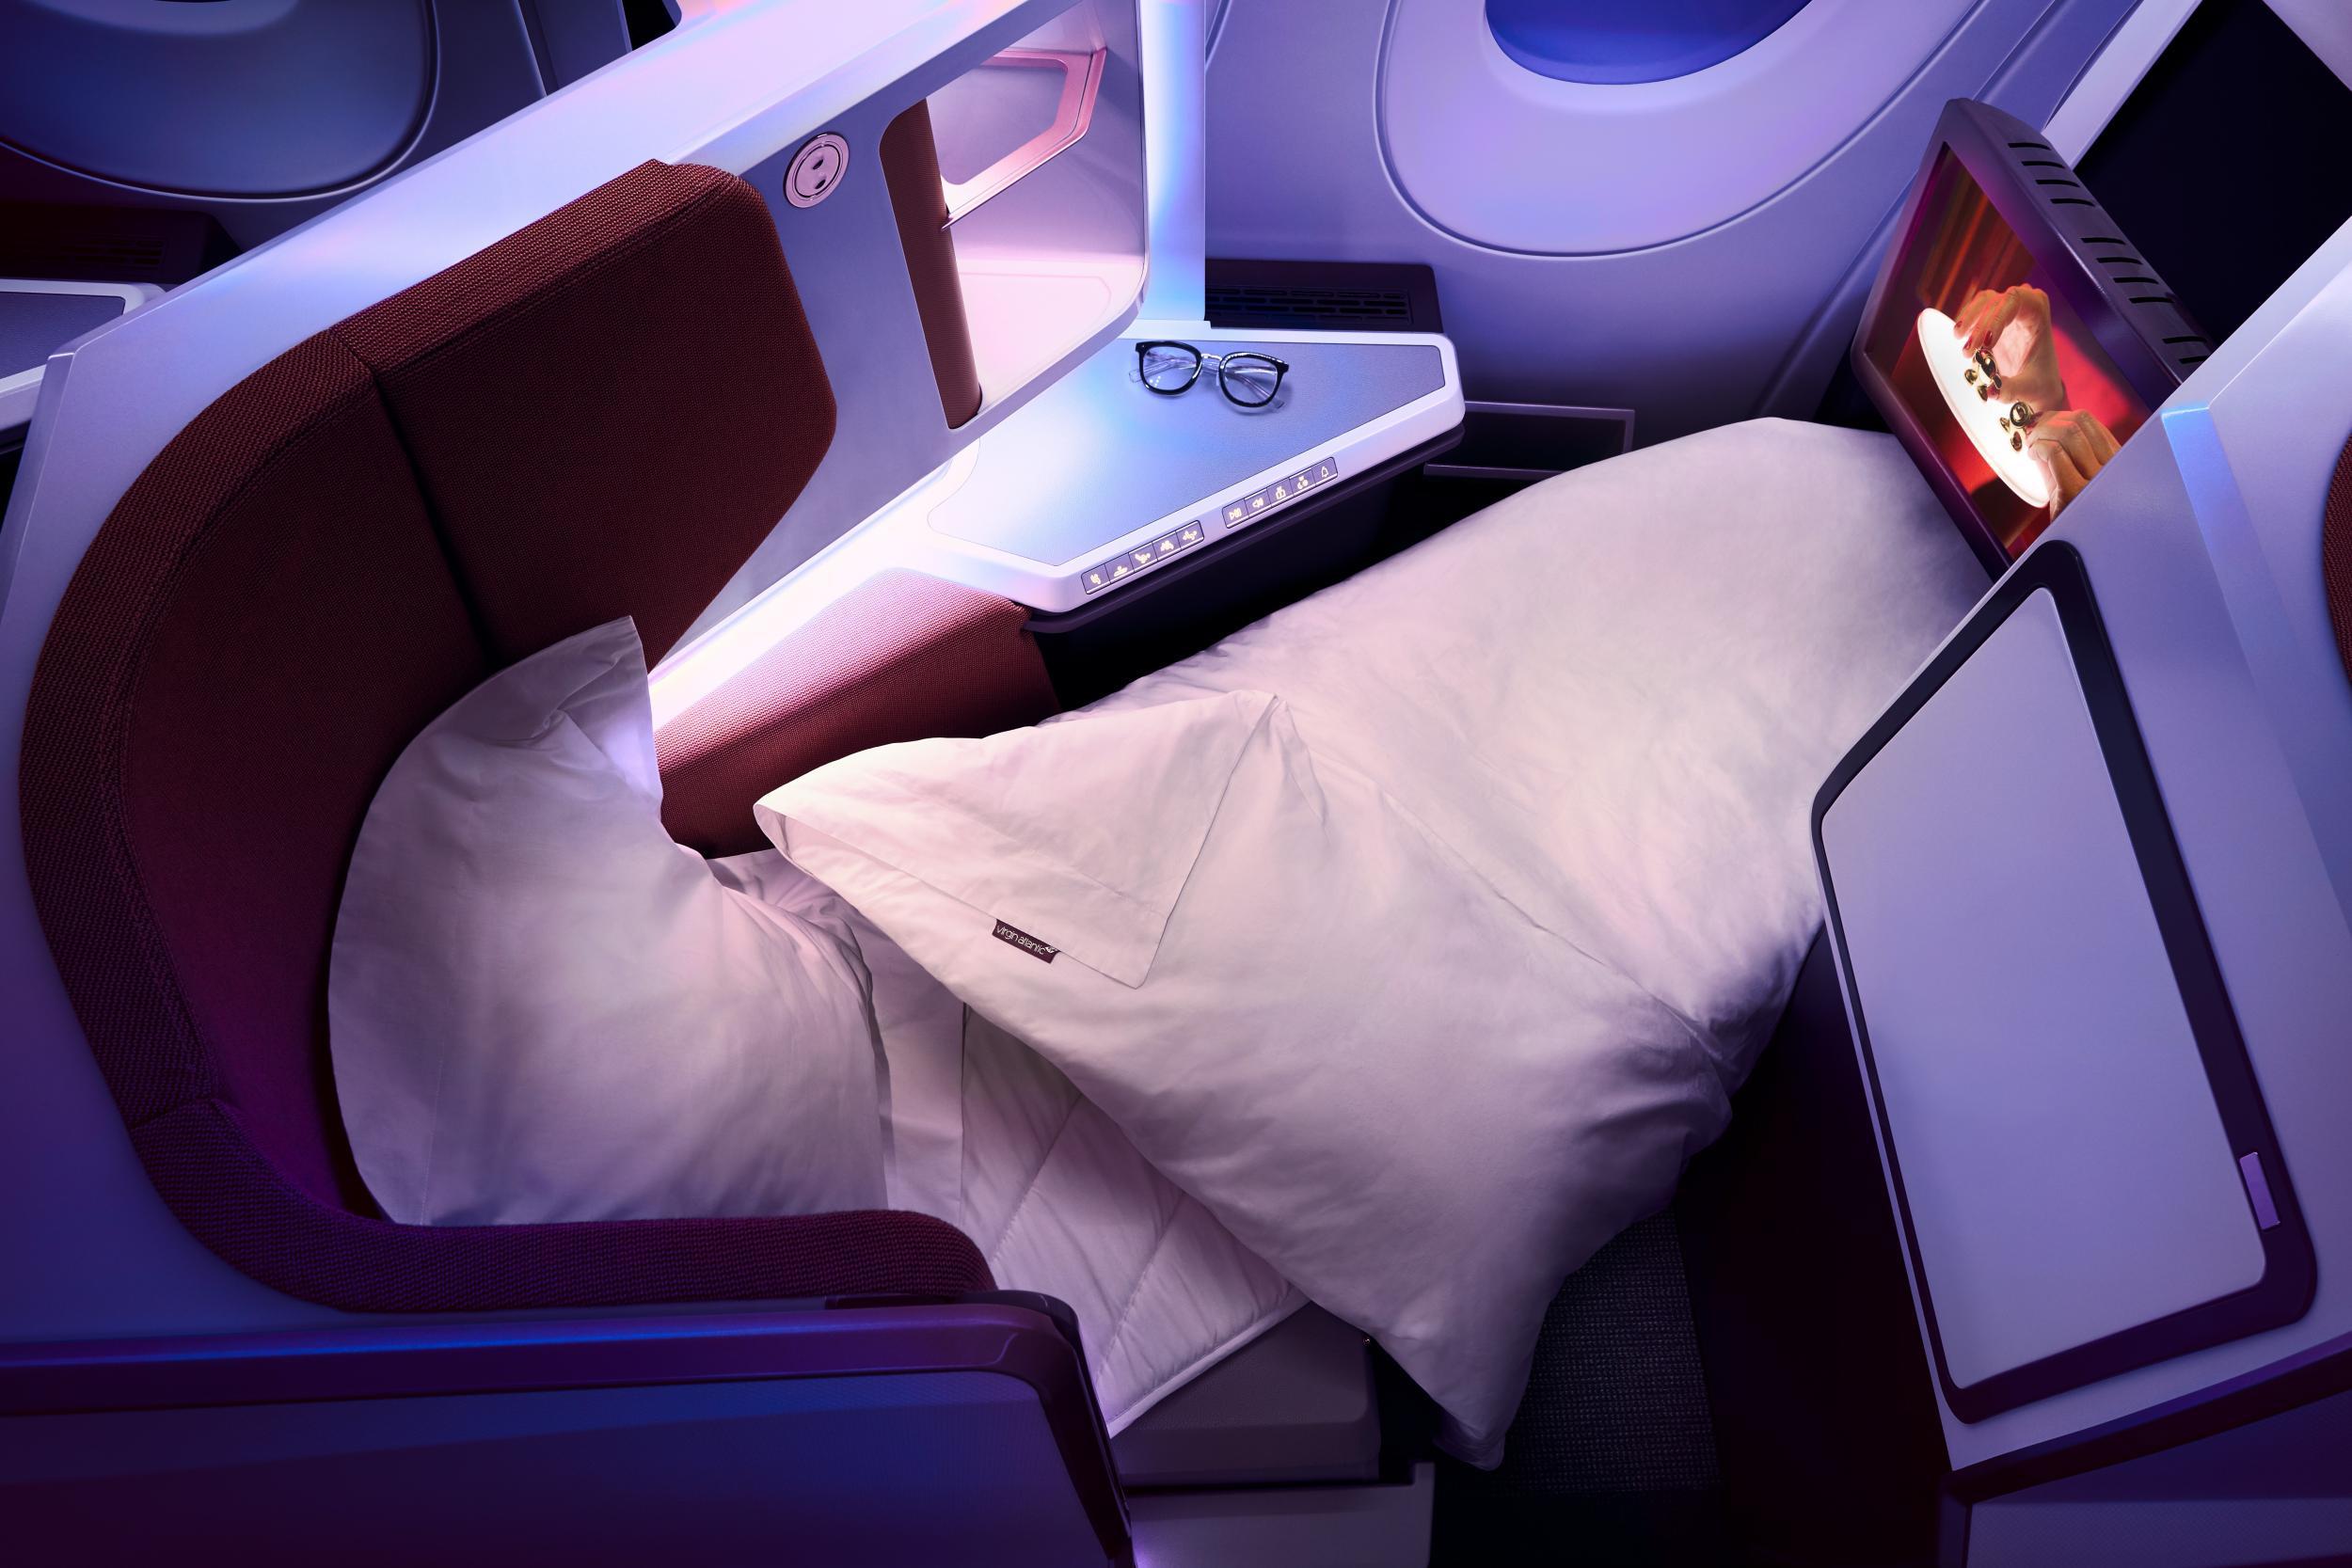 VS A35K Overhead 3 (Virgin Atlantic)